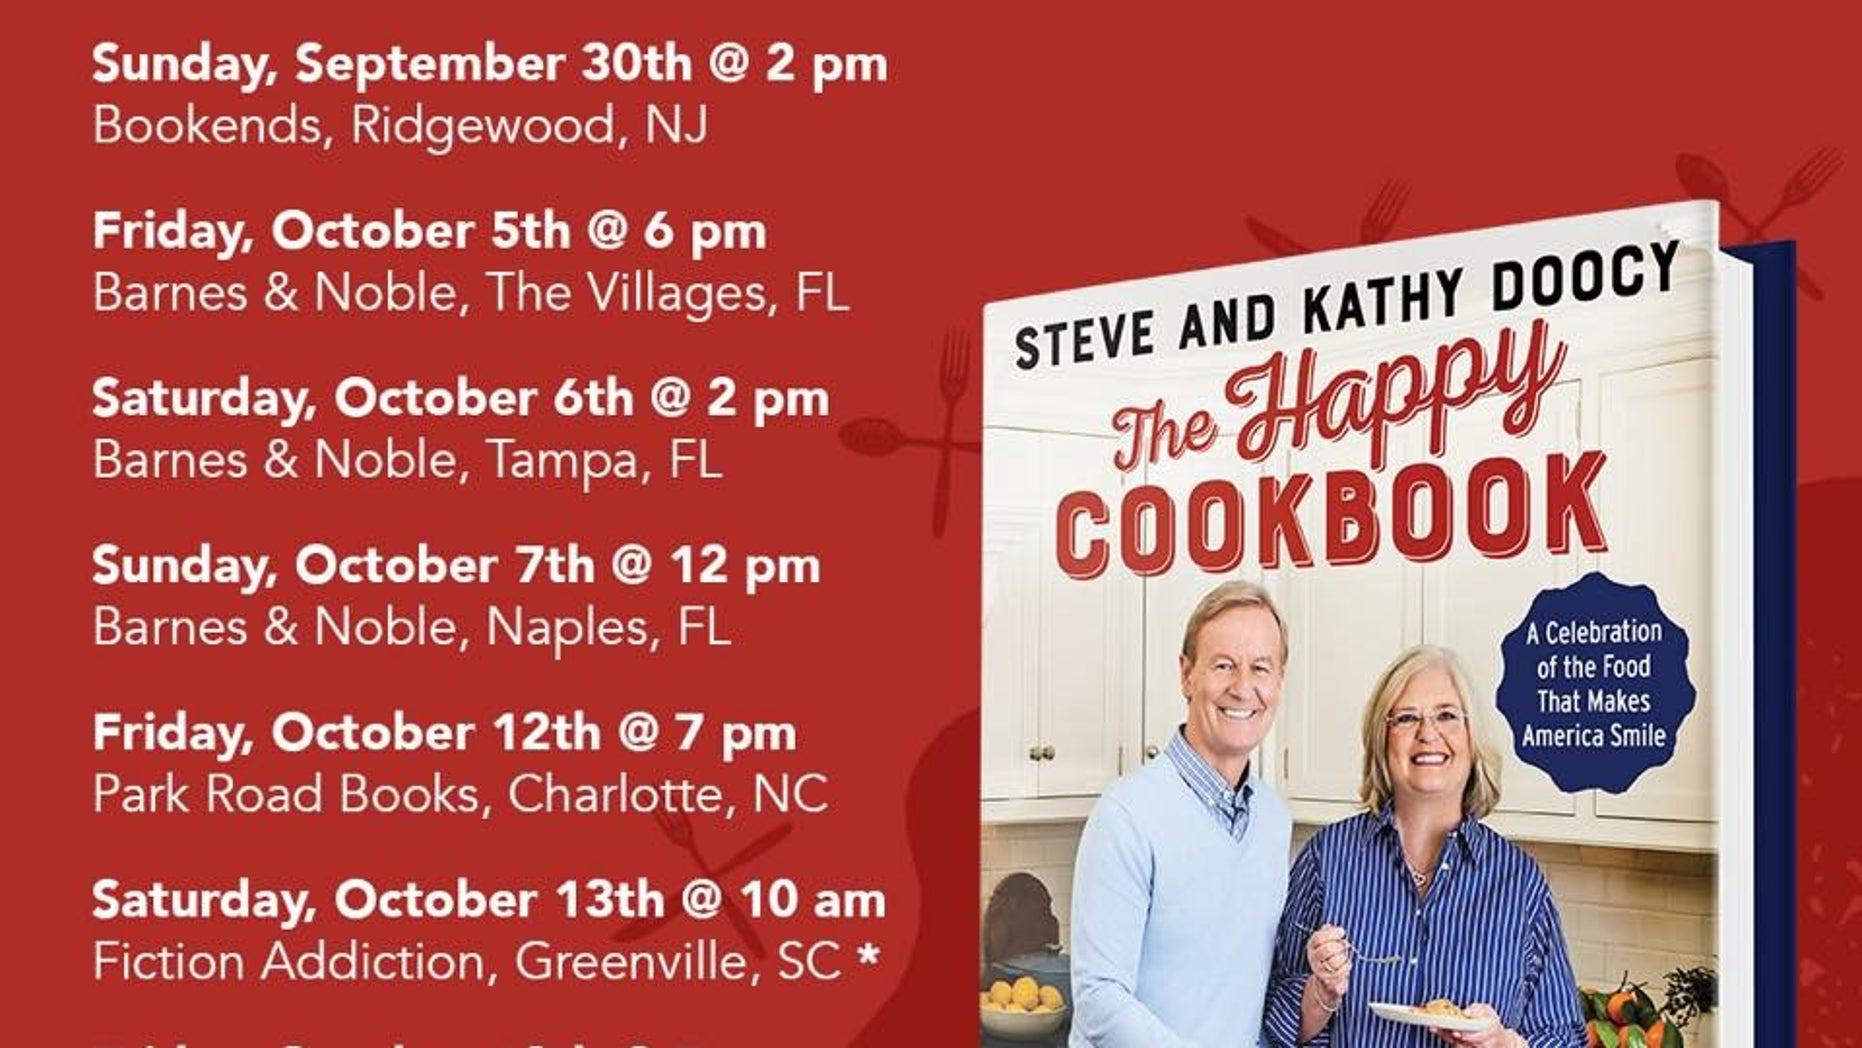 Meet Steve Kathy Doocy On The Happy Cookbook Tour Fox News